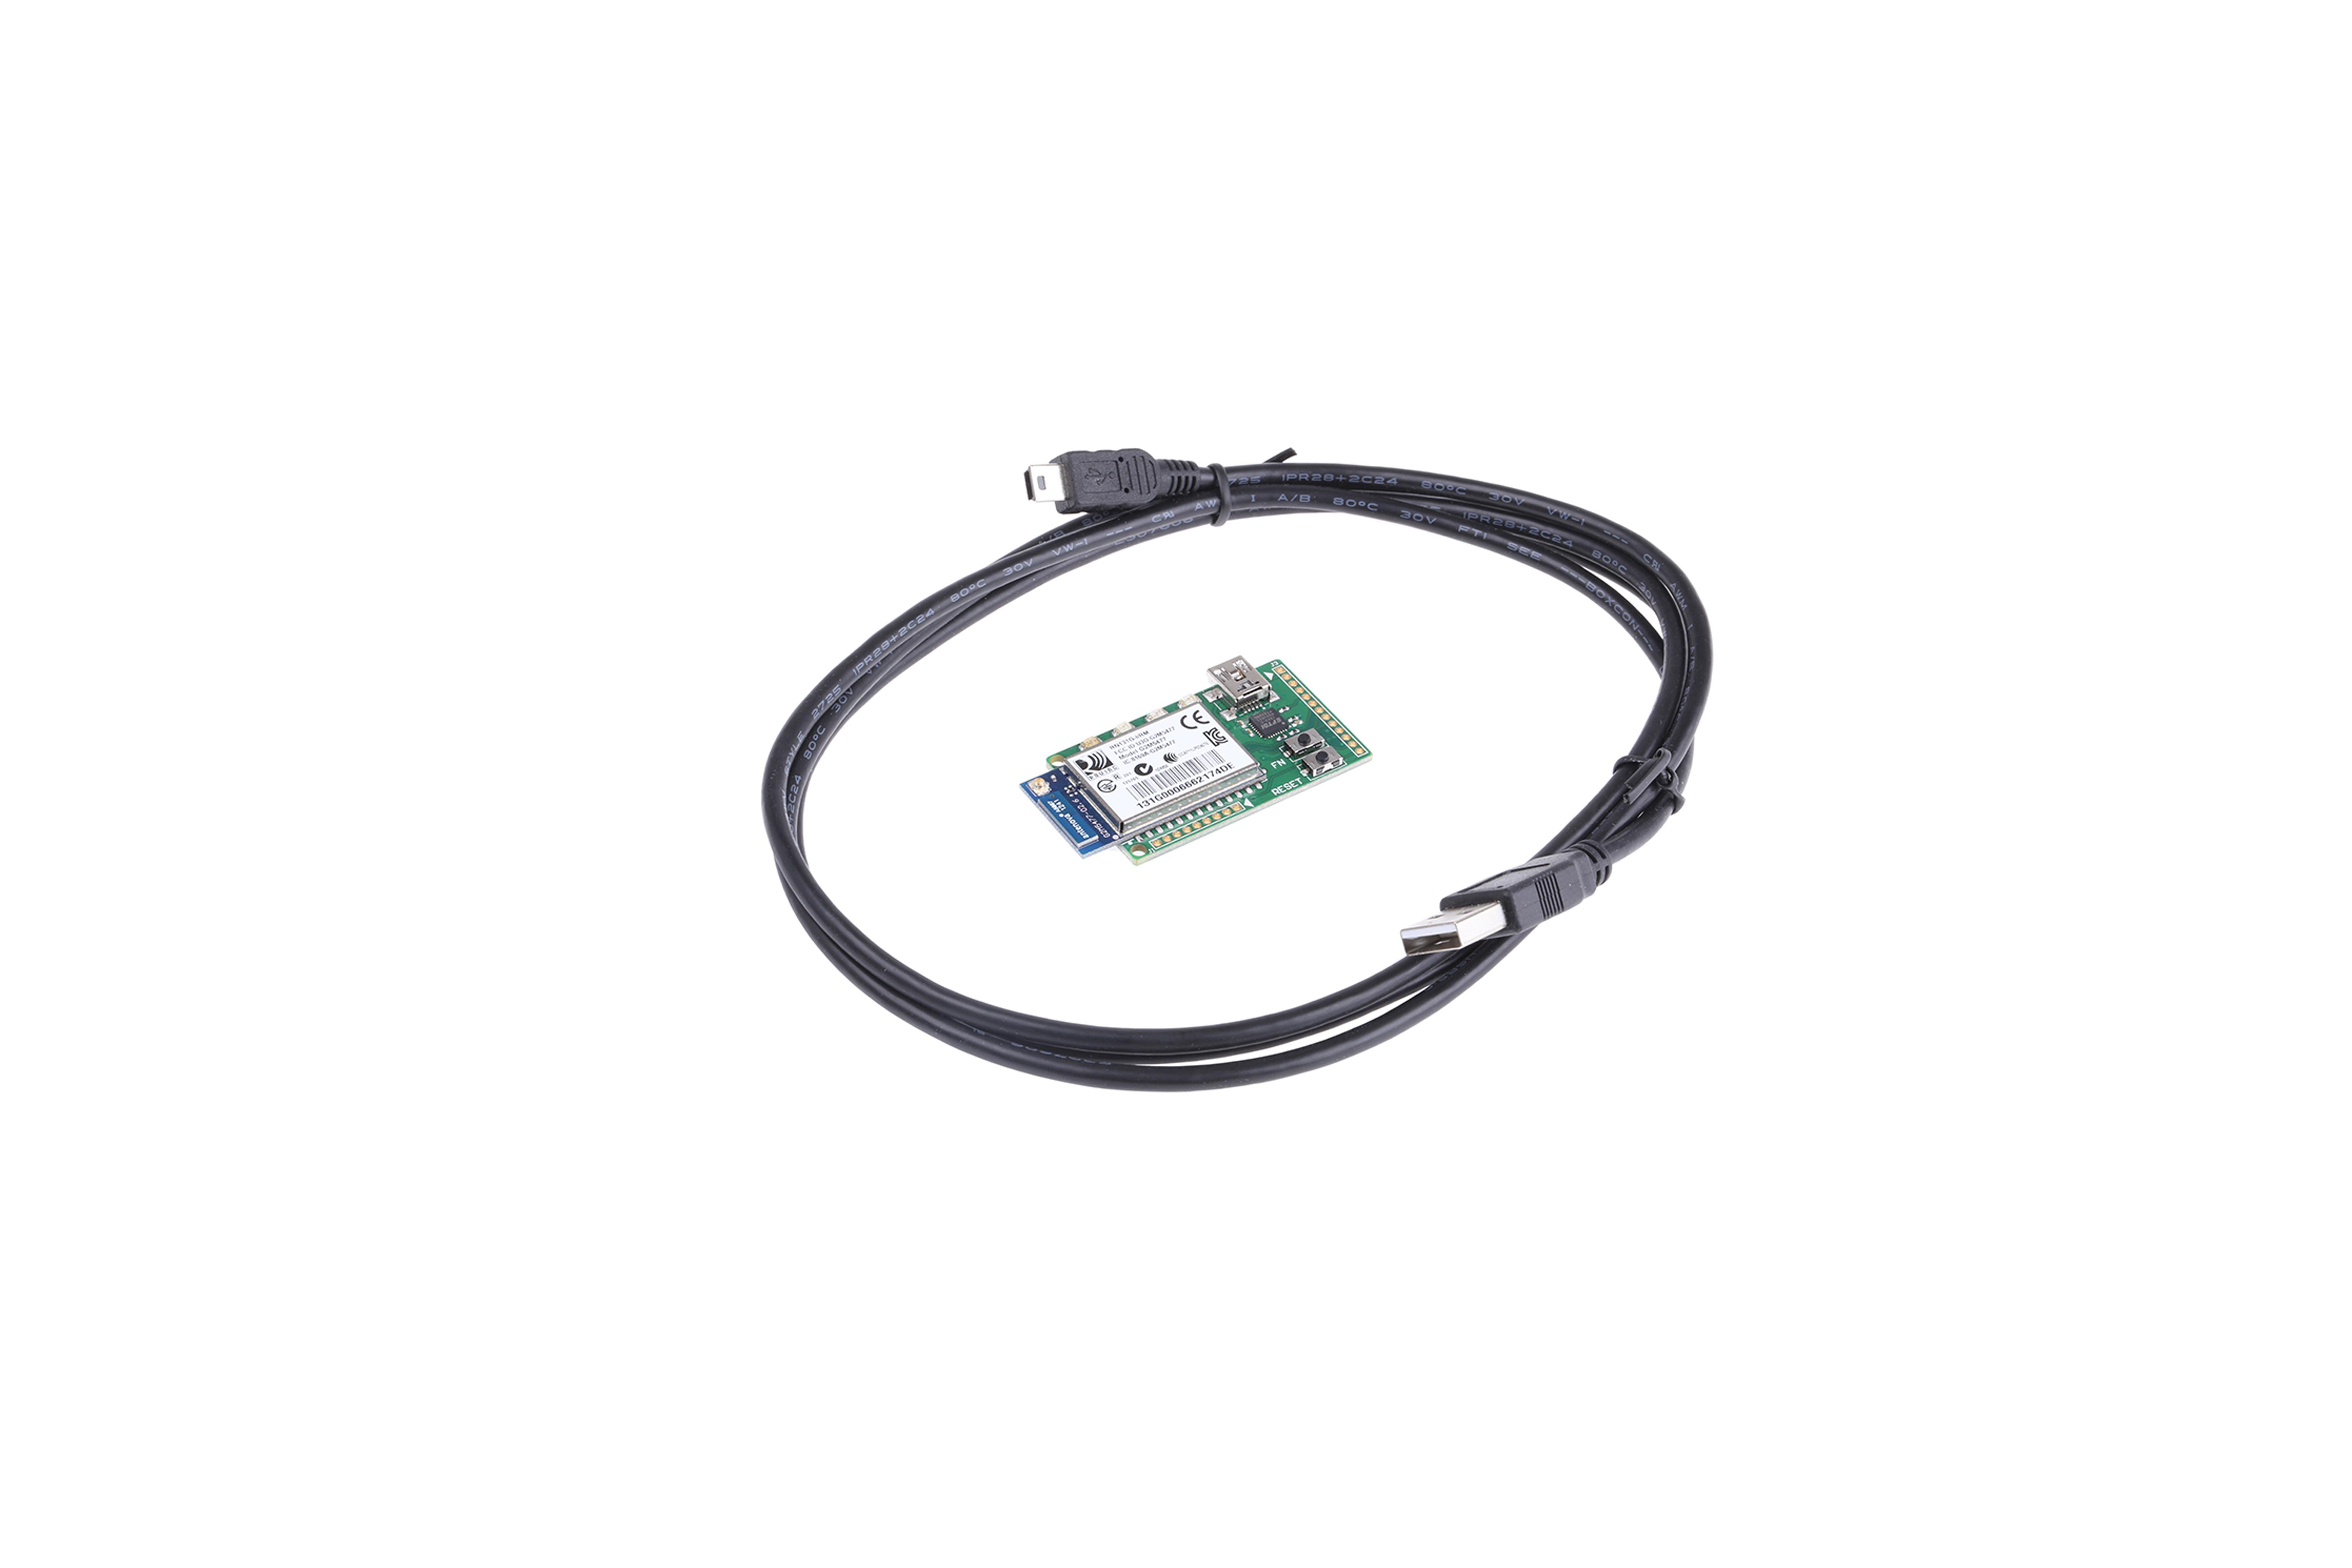 KIT D'ÉVALUATION USB MODULE RN131 WI-FI